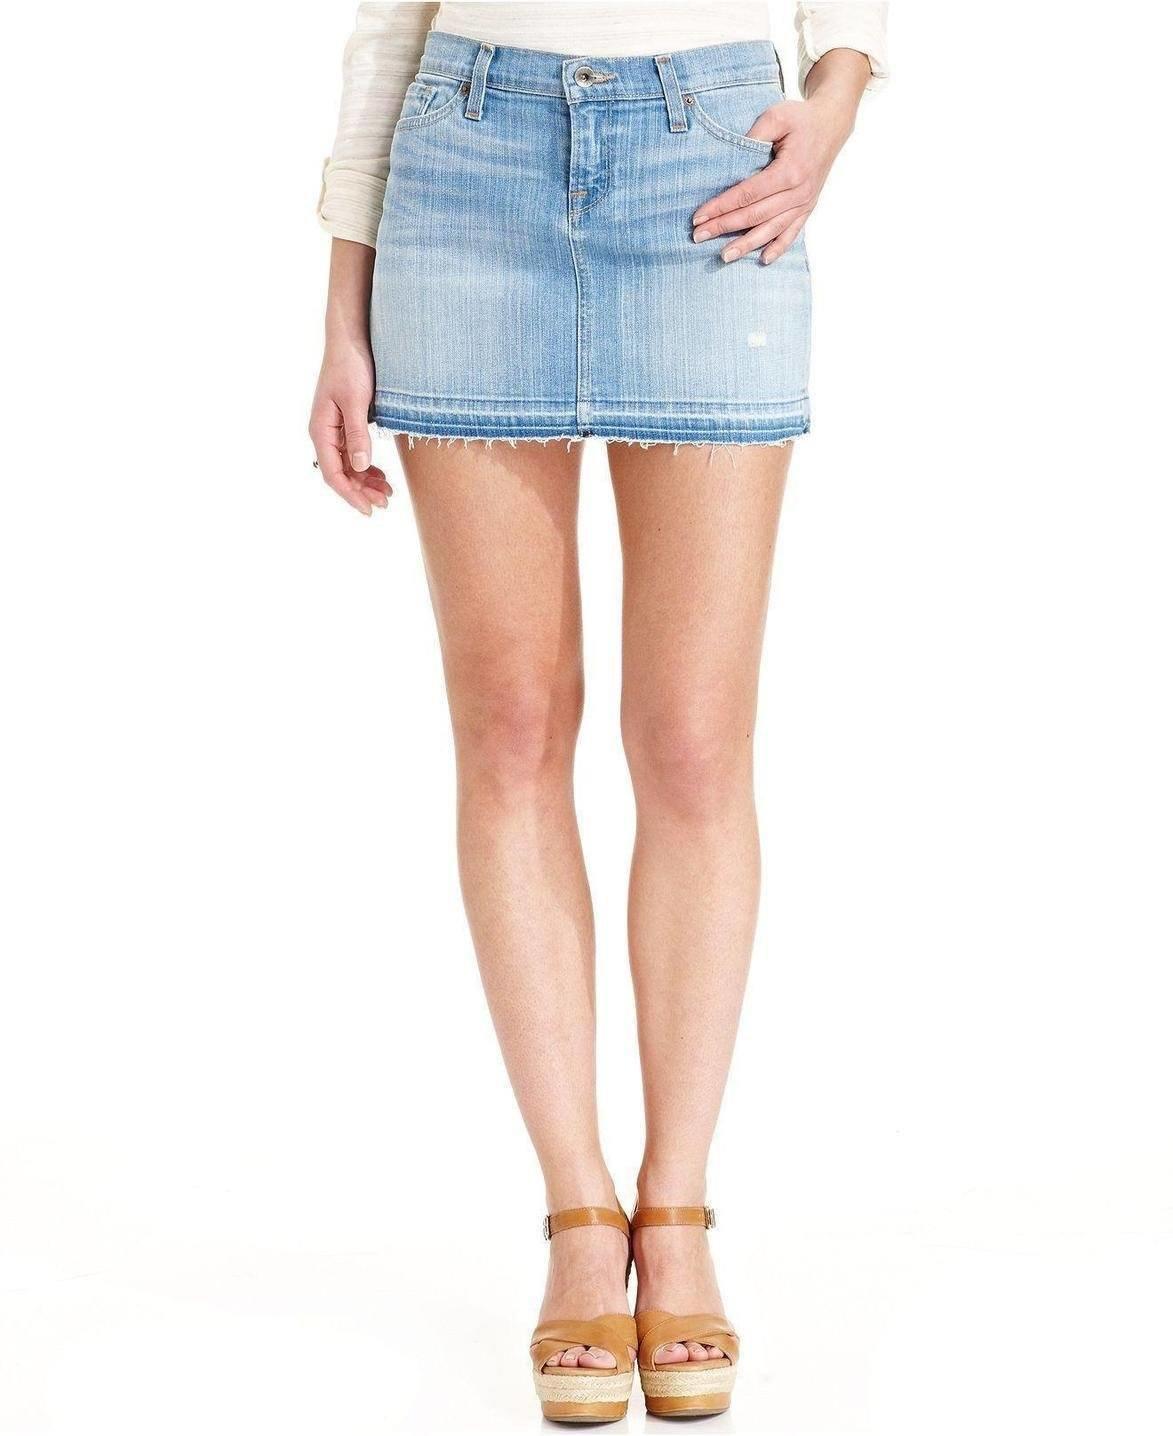 Картинки мини юбки джинсовые